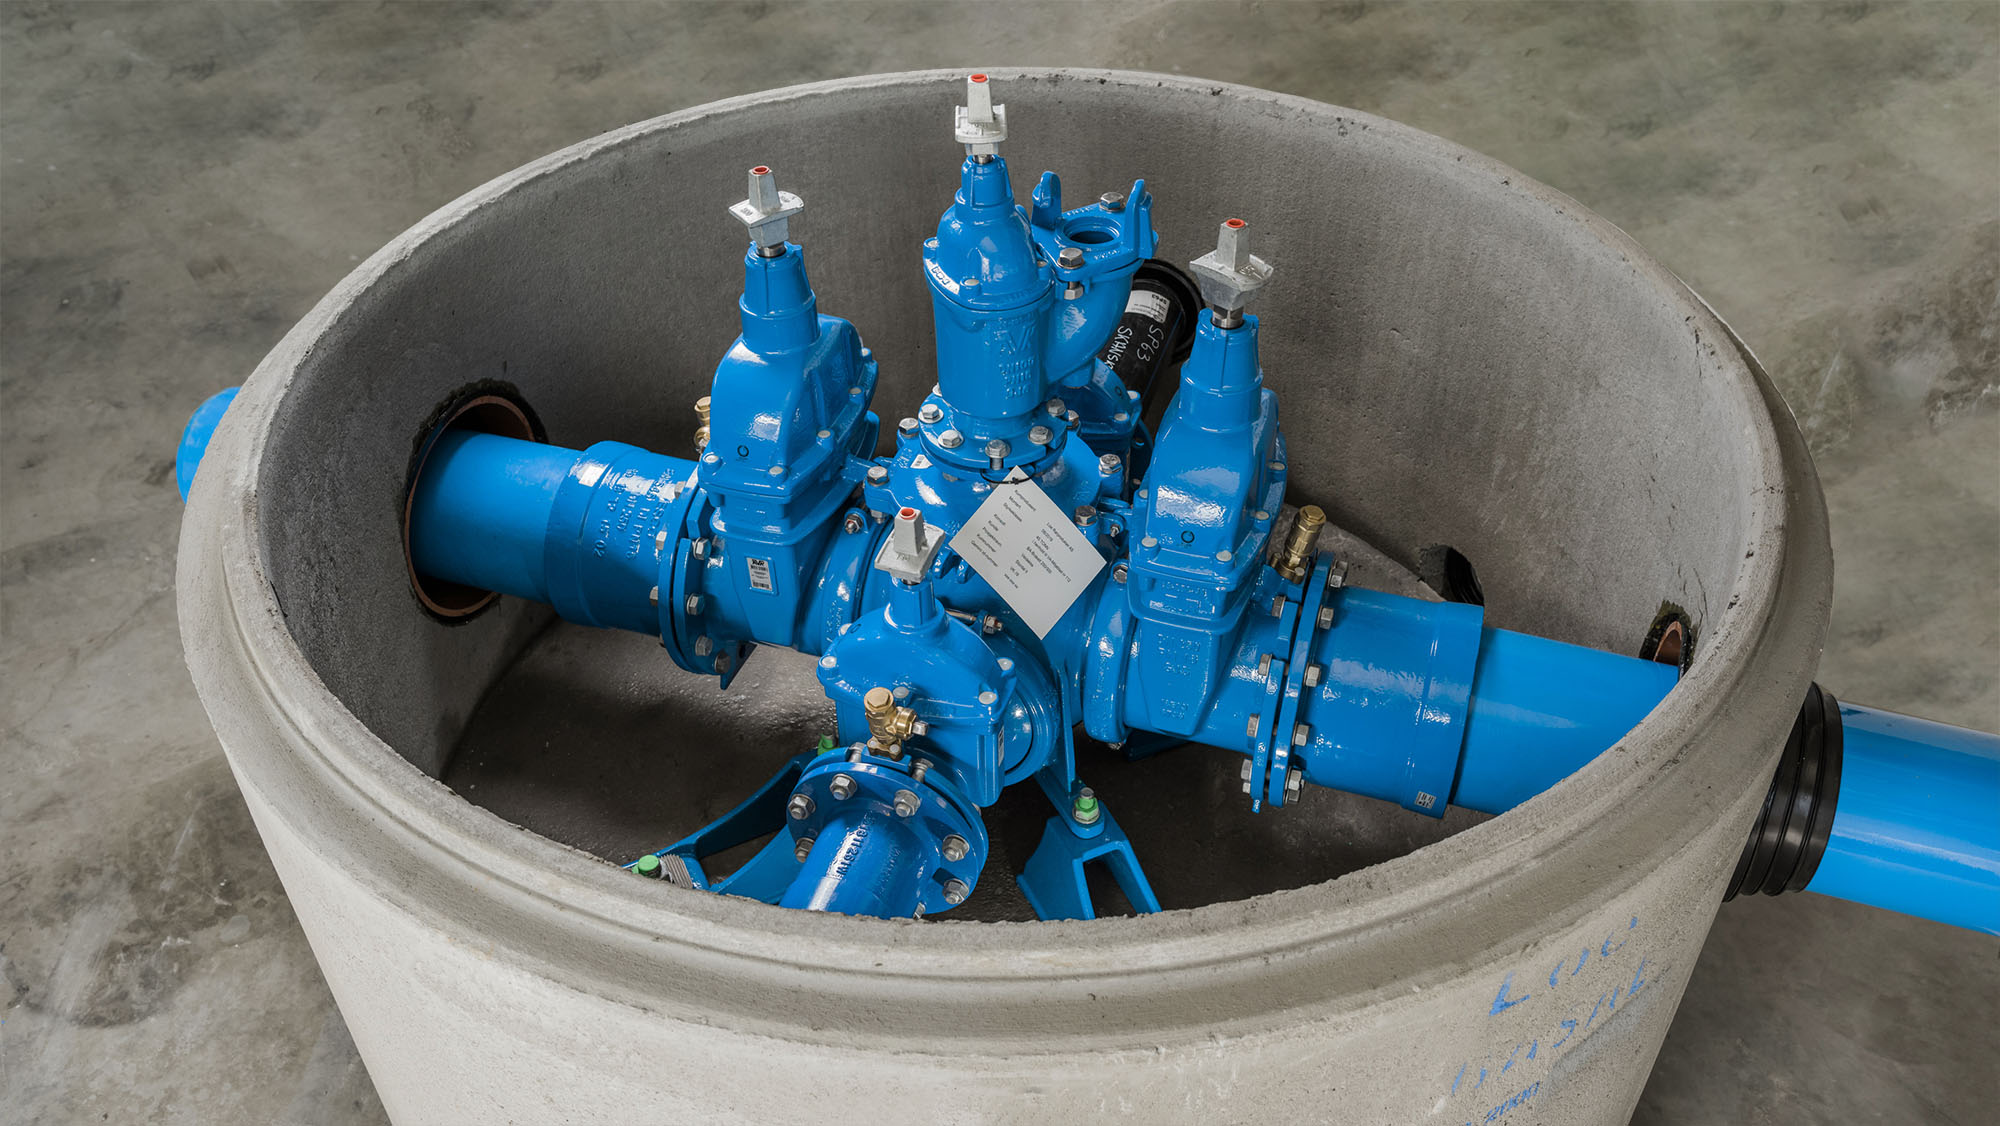 Basal AQUA-SAFE vannkum tilfredsstiller alle krav i VA miljøblad nr. 112